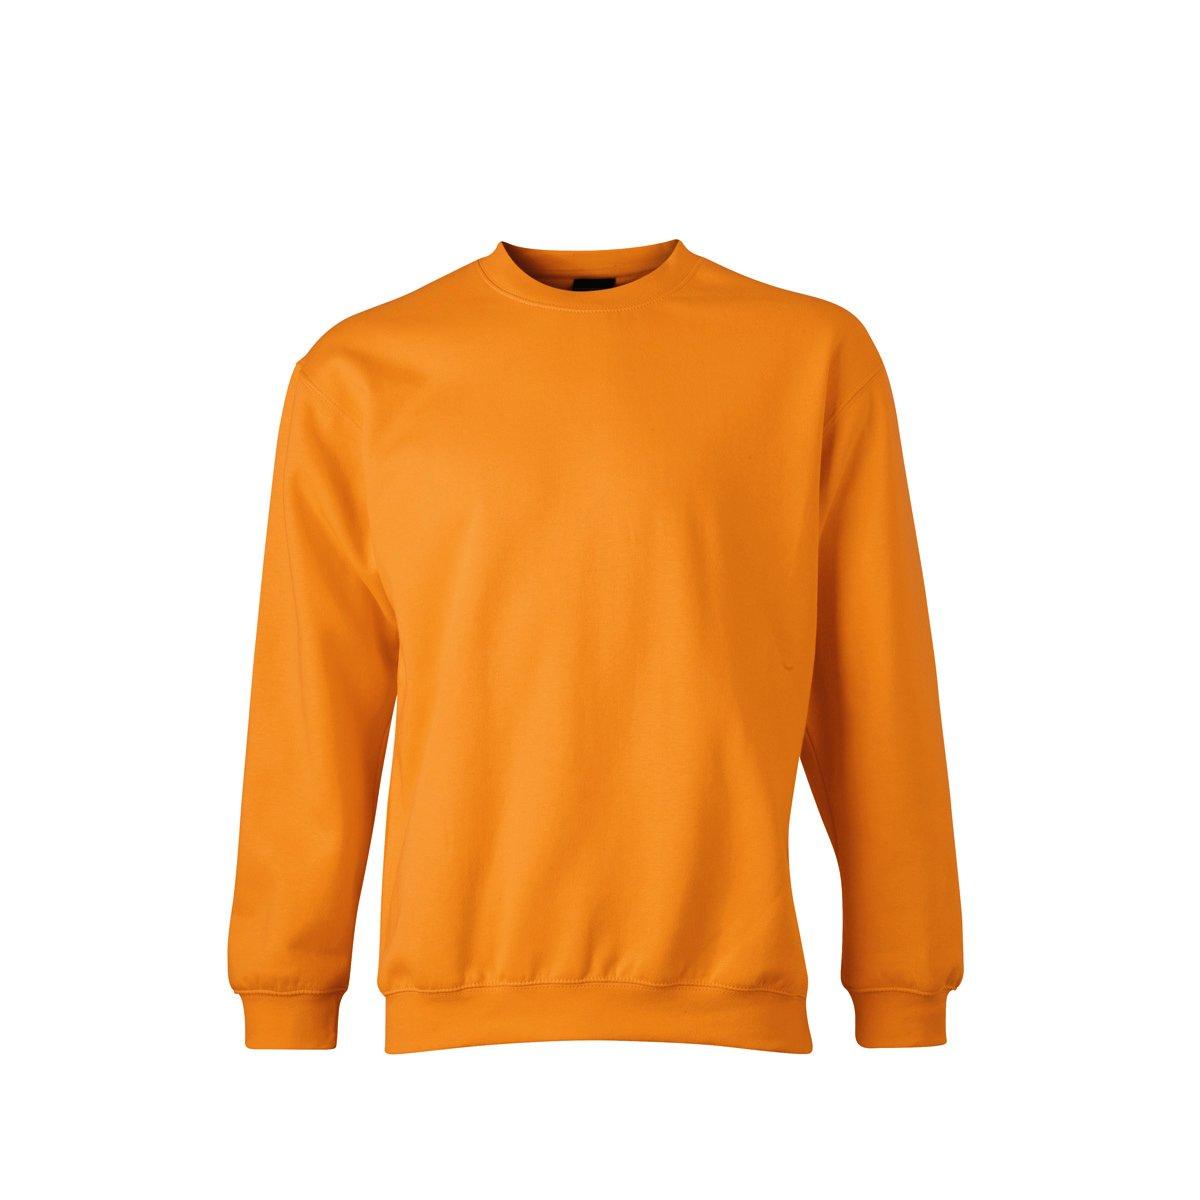 James /& Nicholson Big Boys Plain Round Collar Long Sleeve Sweatshirt